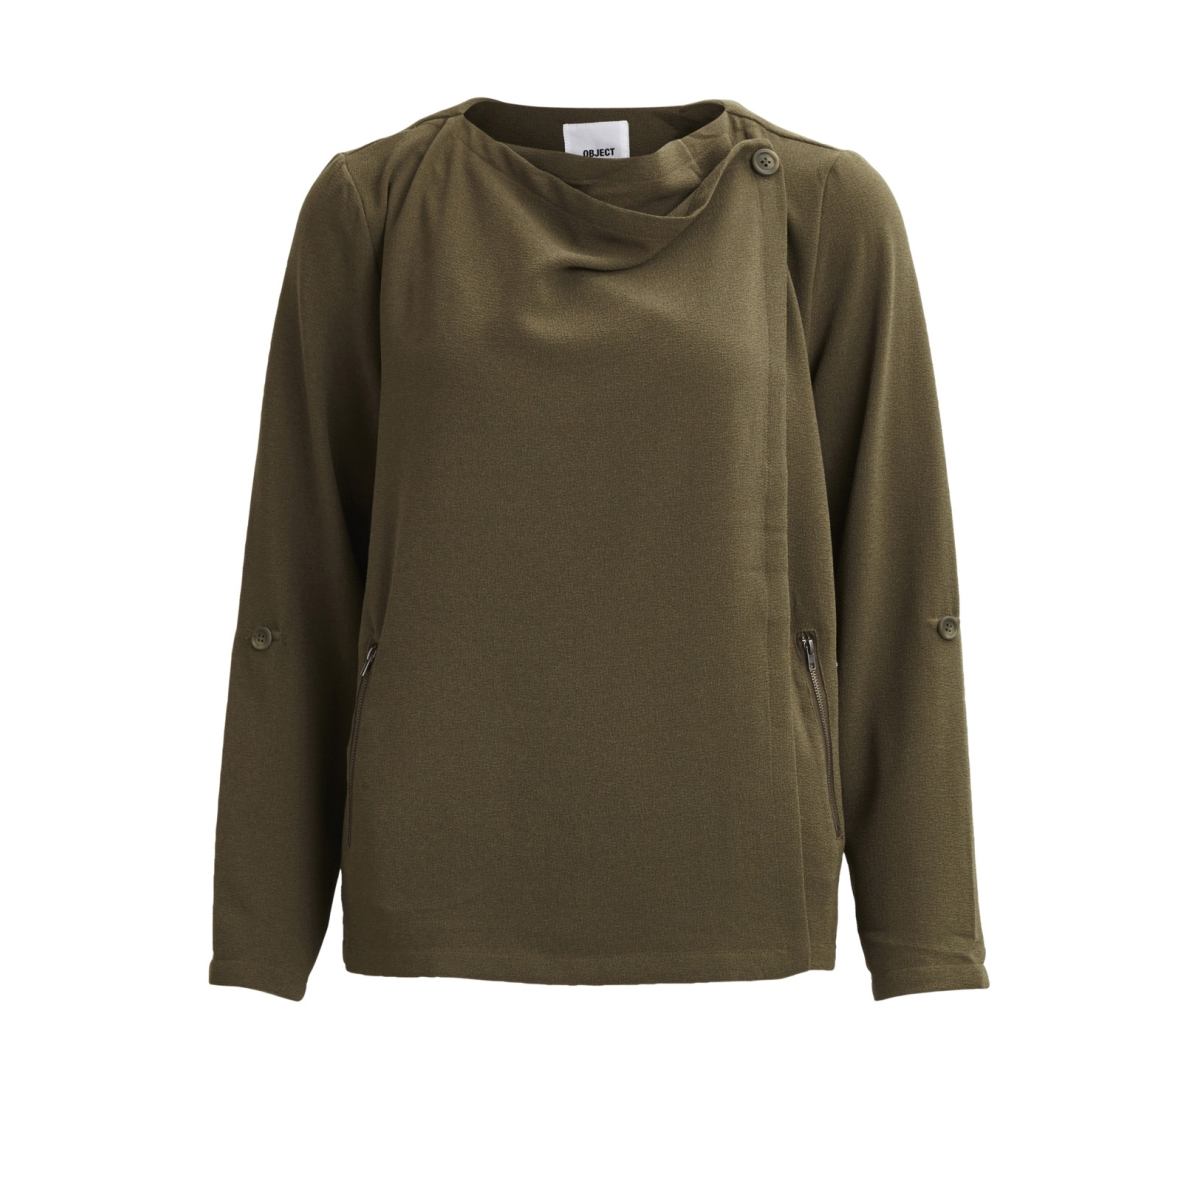 objannlee l/s blazer noos 23023665 object blazer ivy green